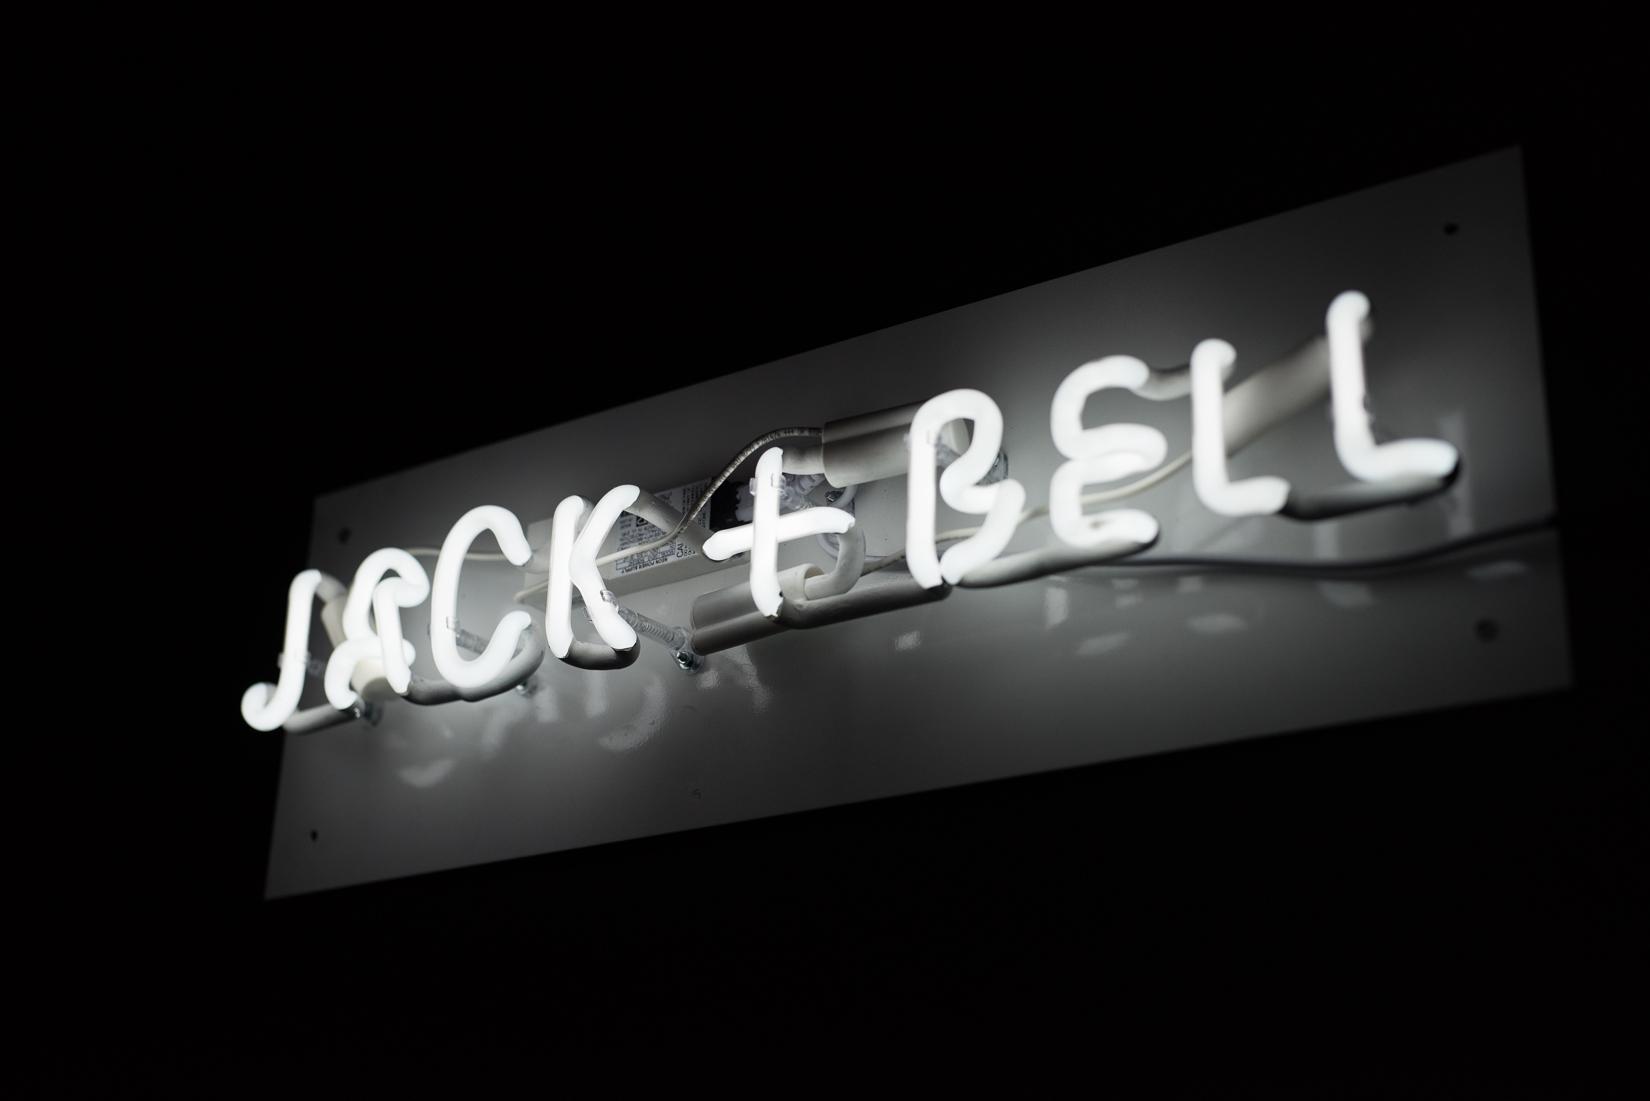 Jack_Bell-286.jpg